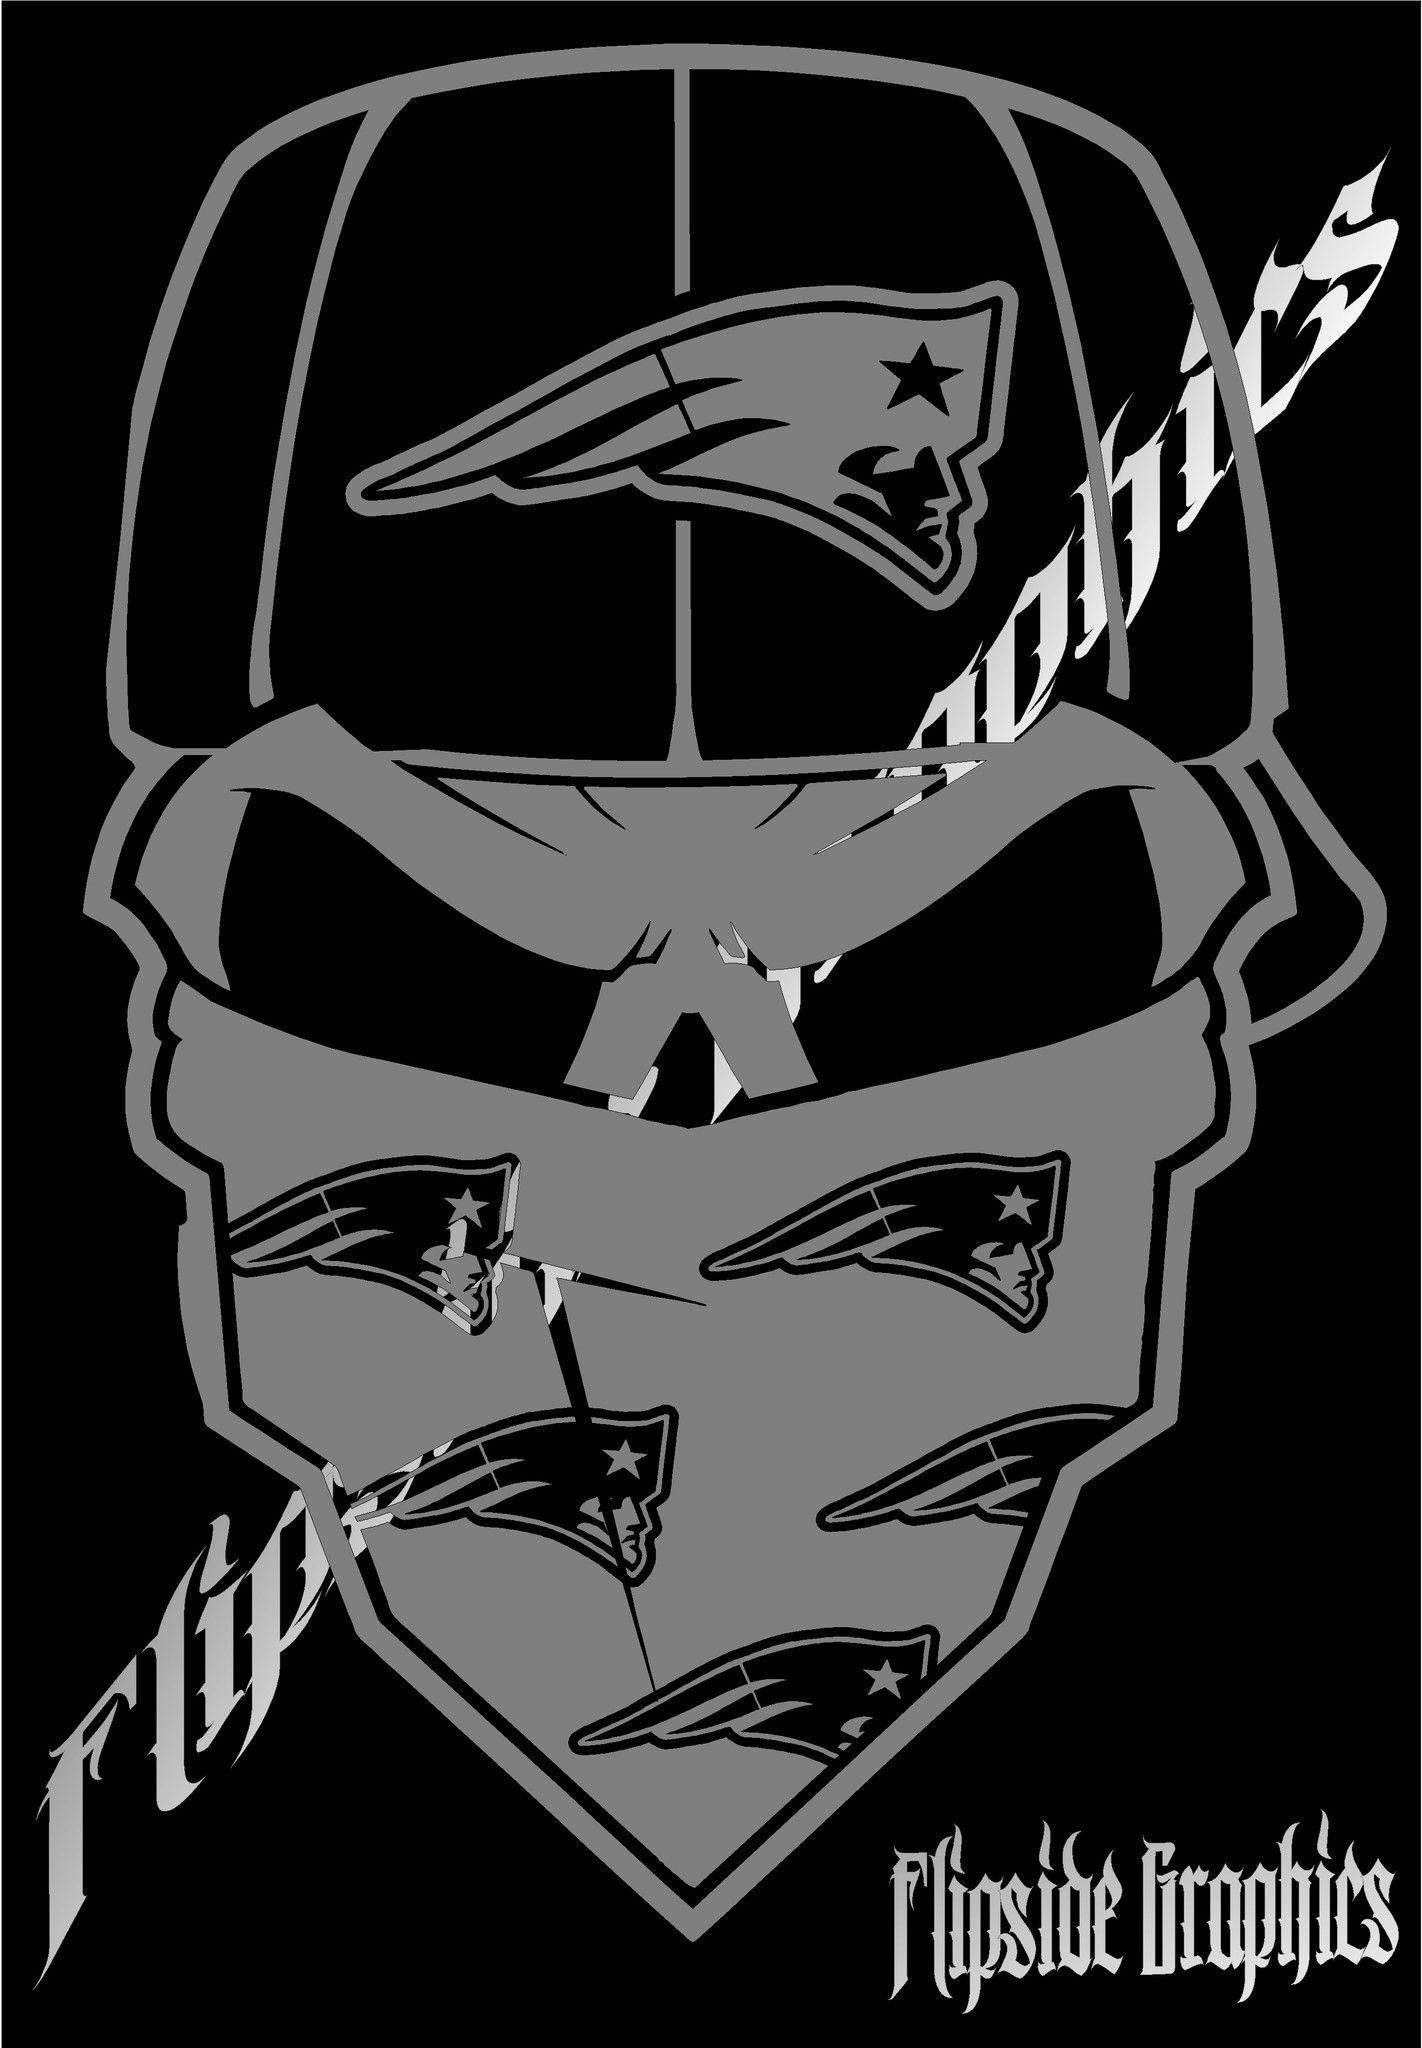 Custom Decal Bandana New England Patriots 24.95 via